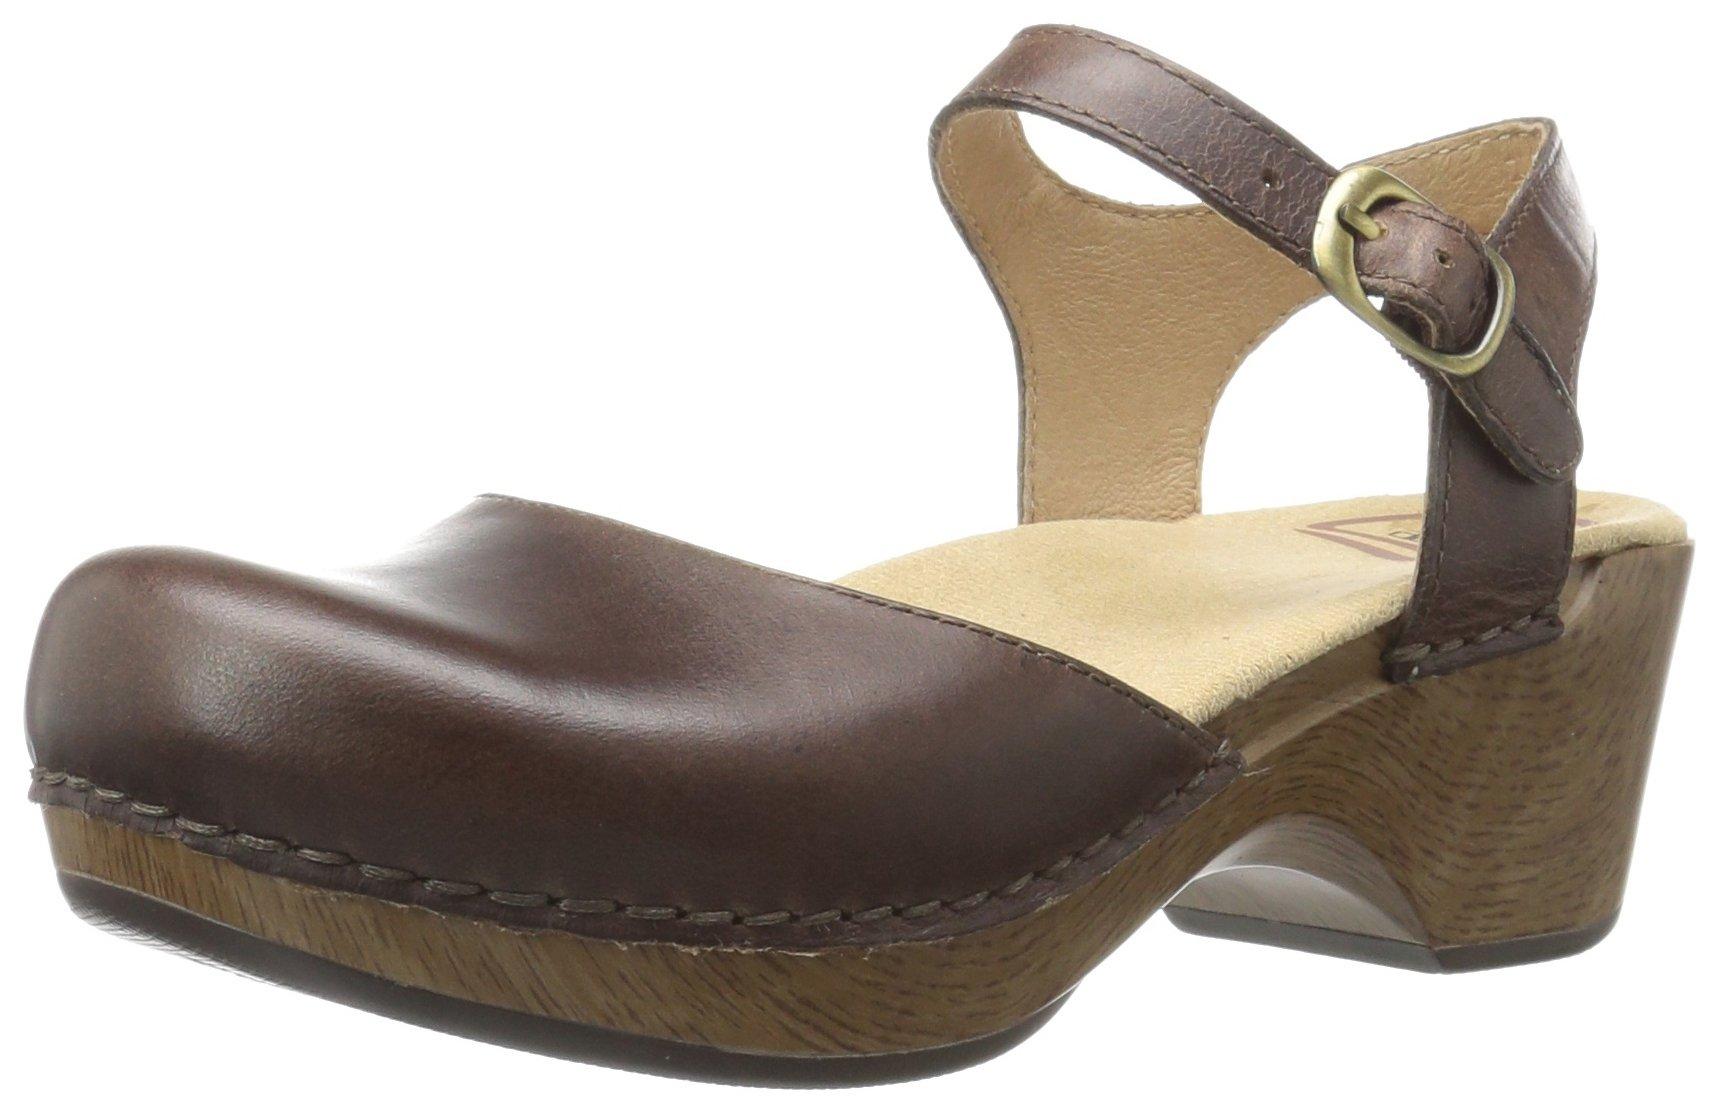 Dansko Women's Sam Flat Sandal, Teak Vintage Pull up, 38 EU/7.5-8 M US